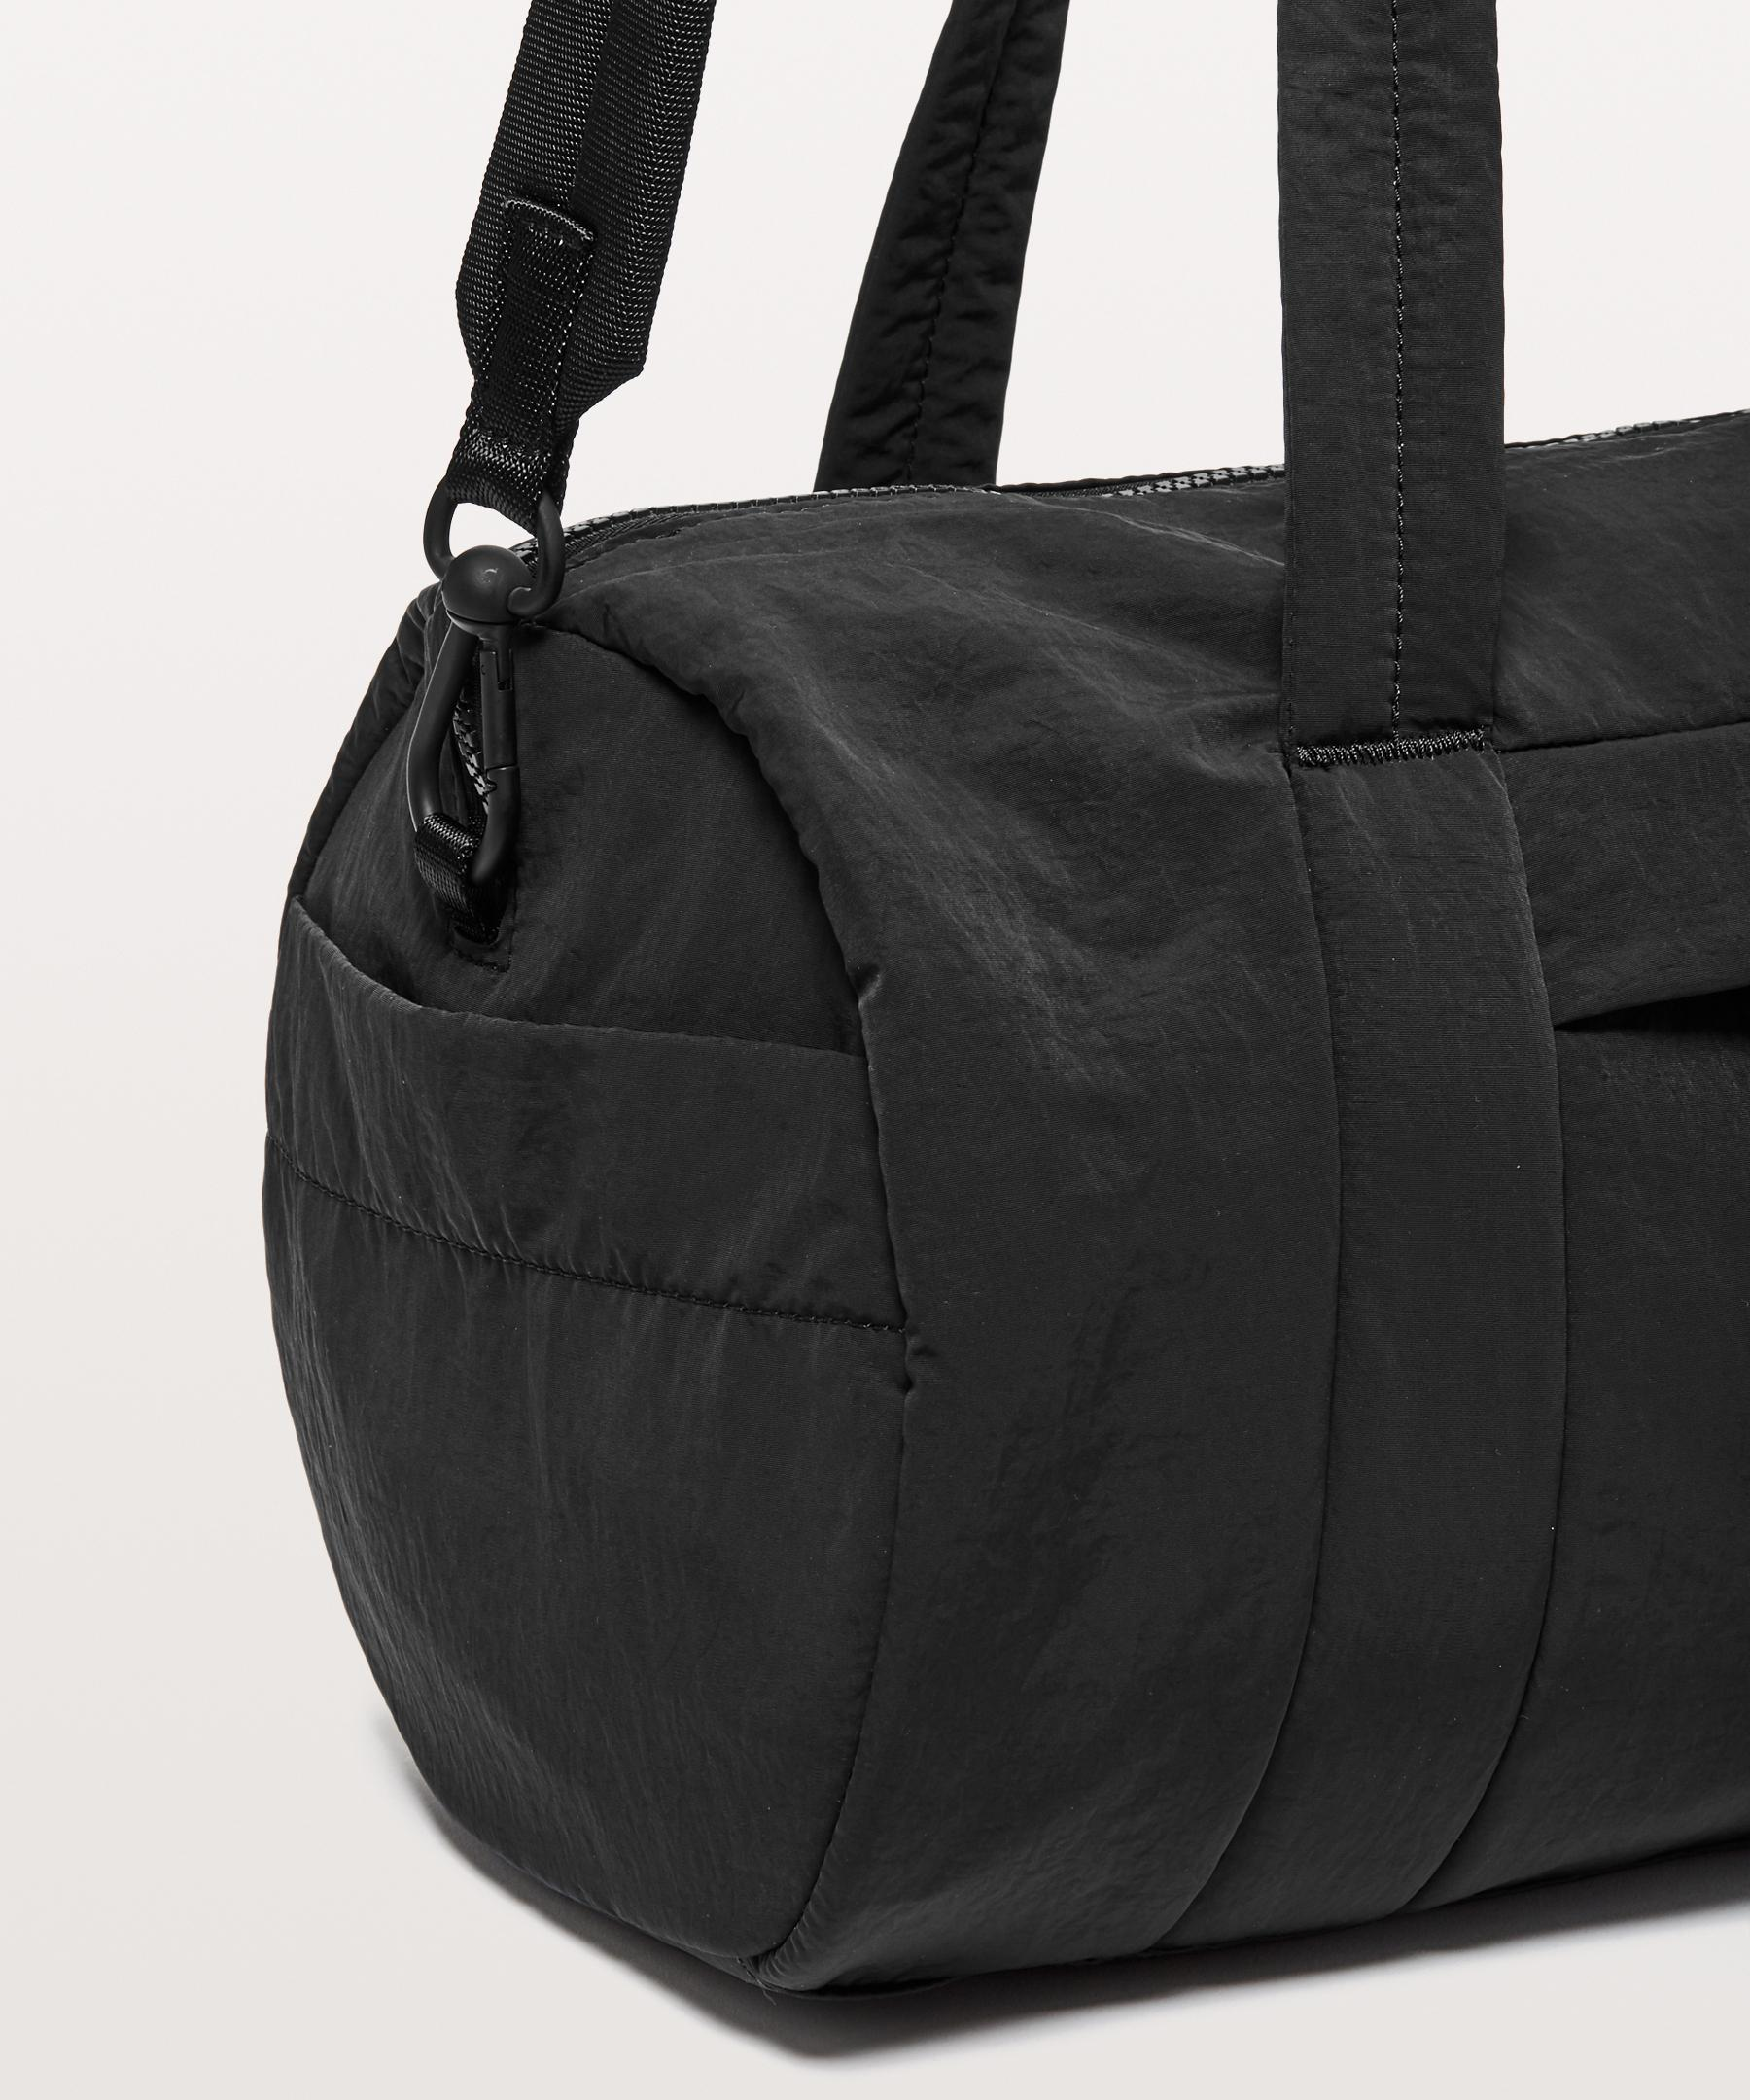 e033d575c8 lululemon athletica On My Level Barrel Bag in Black - Lyst